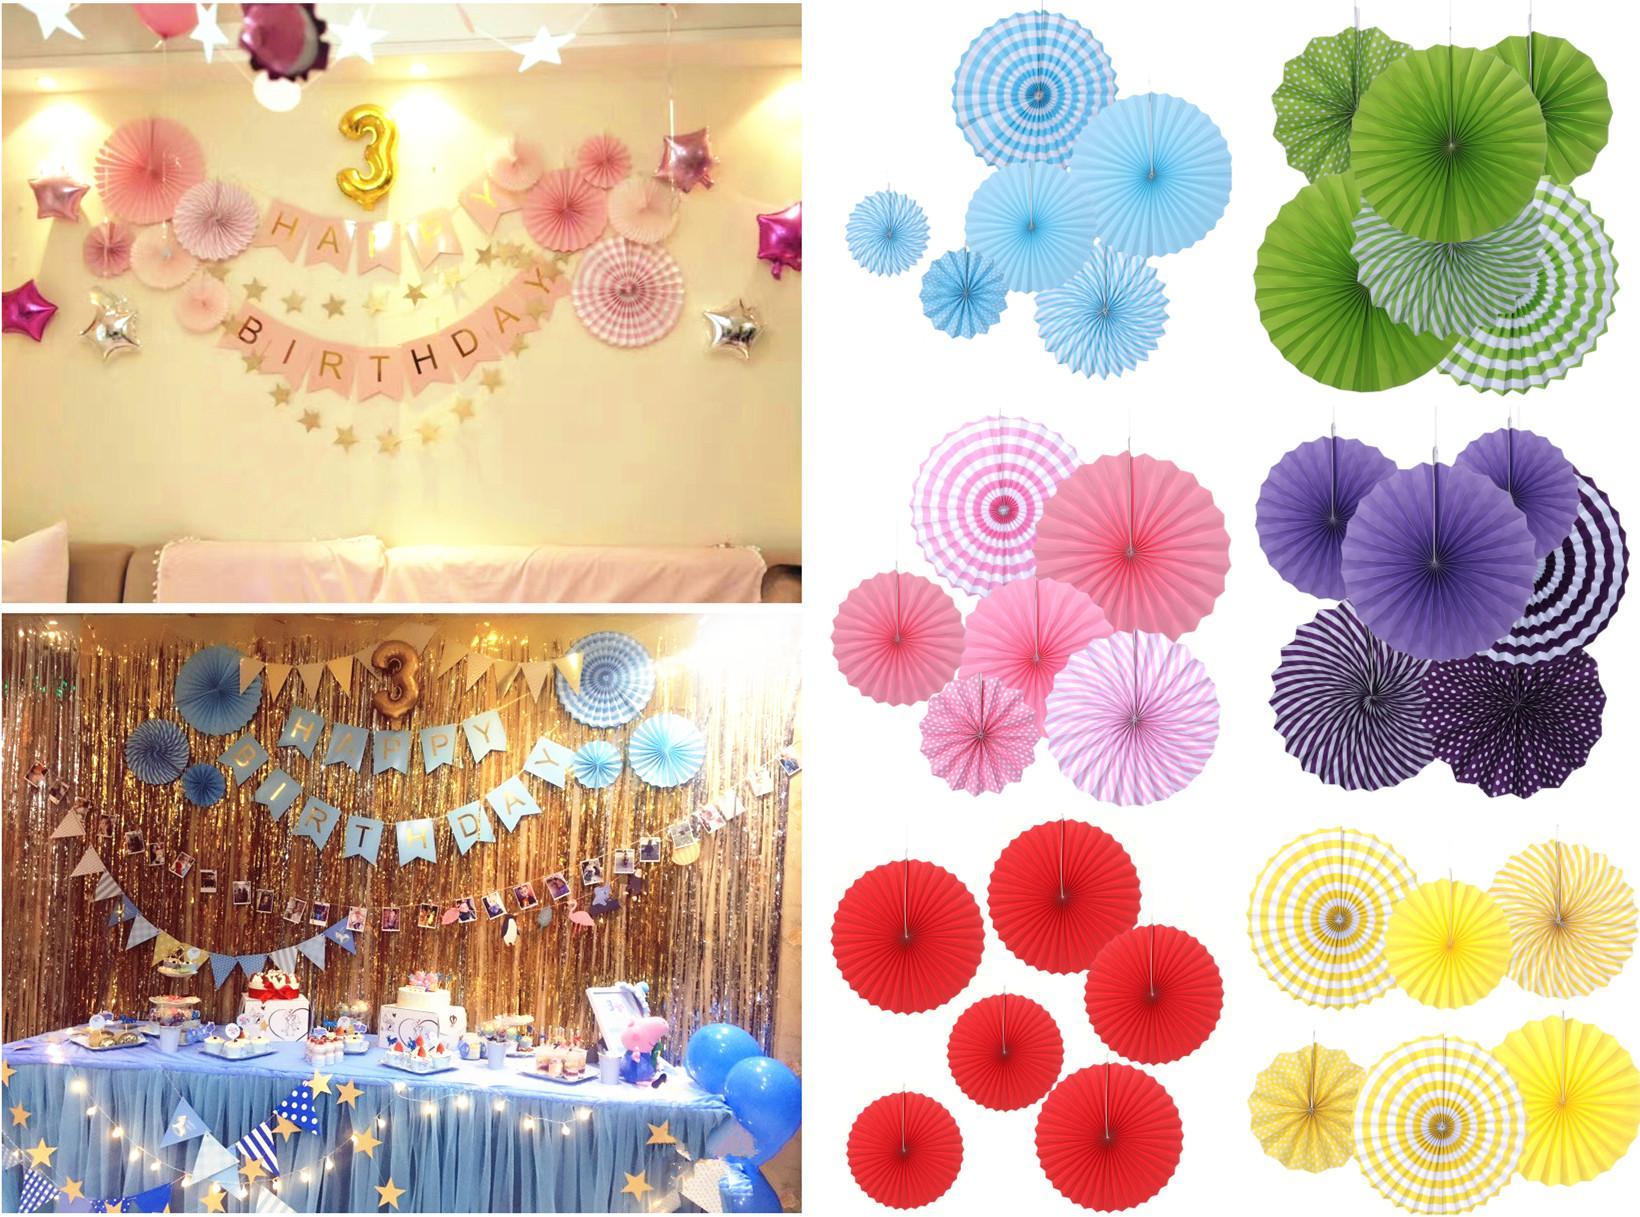 Tissue Paper Cut Out Paper Fans Pinwheels Hanging Flower Paper